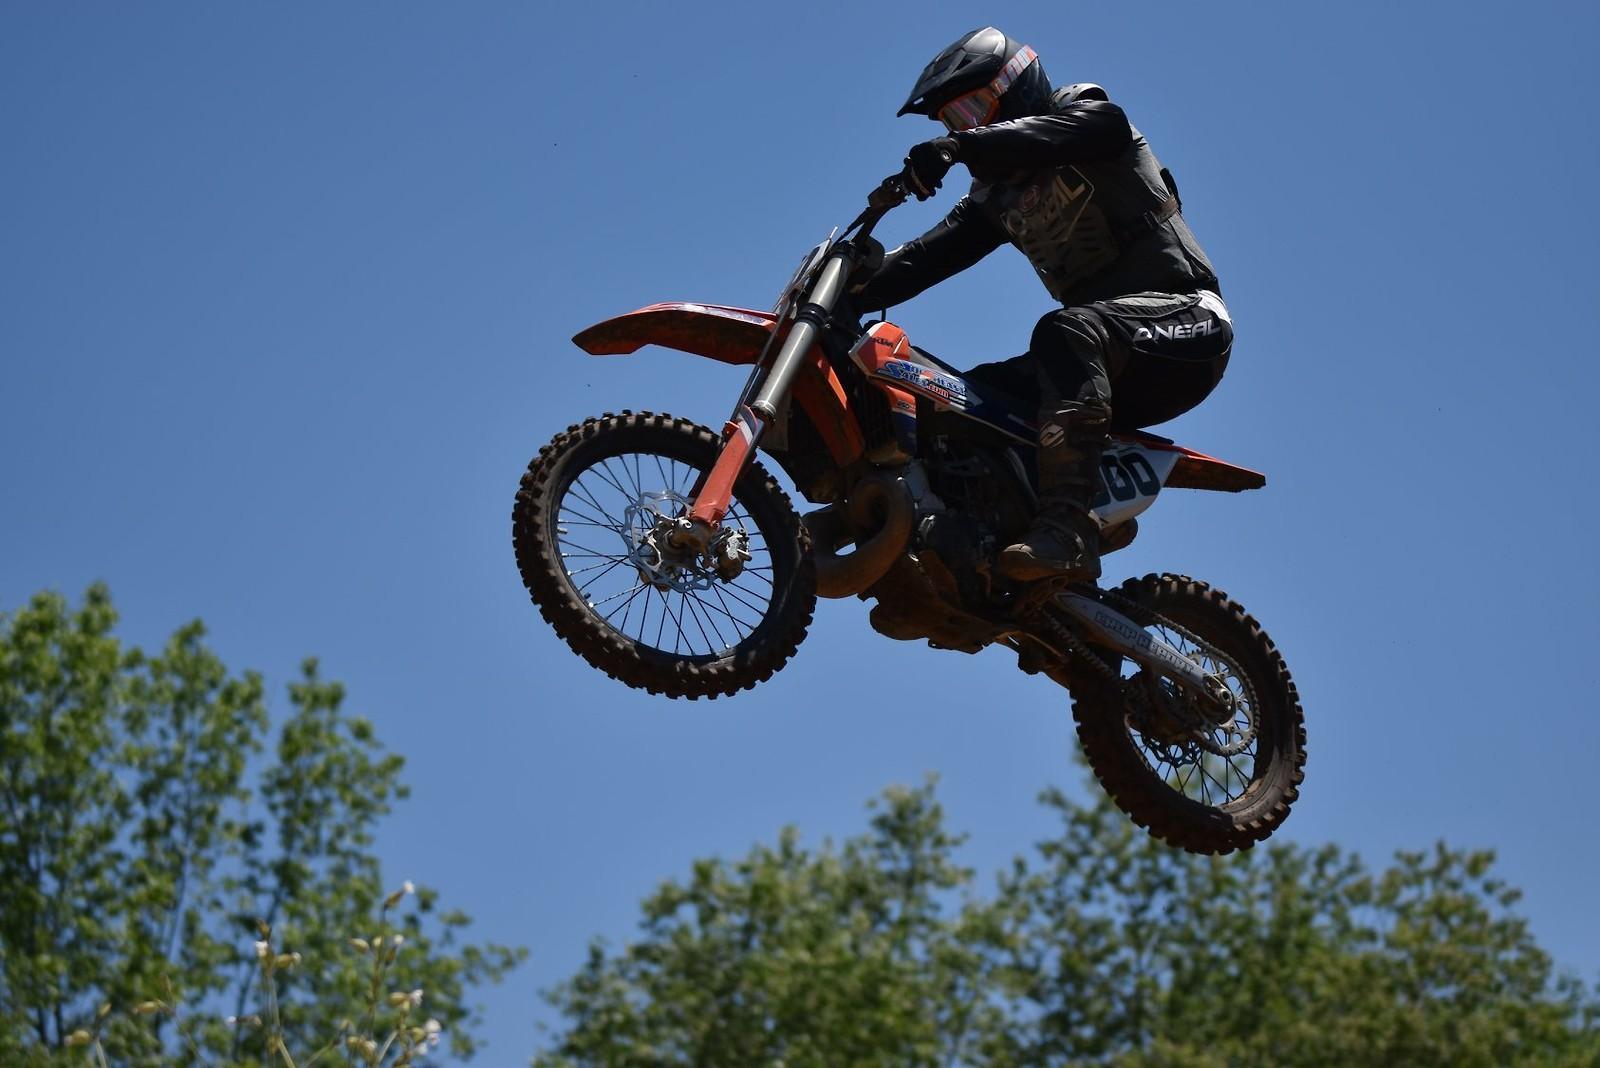 62220235 2256562314596192 7036404930596306944 o - Jeremy_Jonas - Motocross Pictures - Vital MX